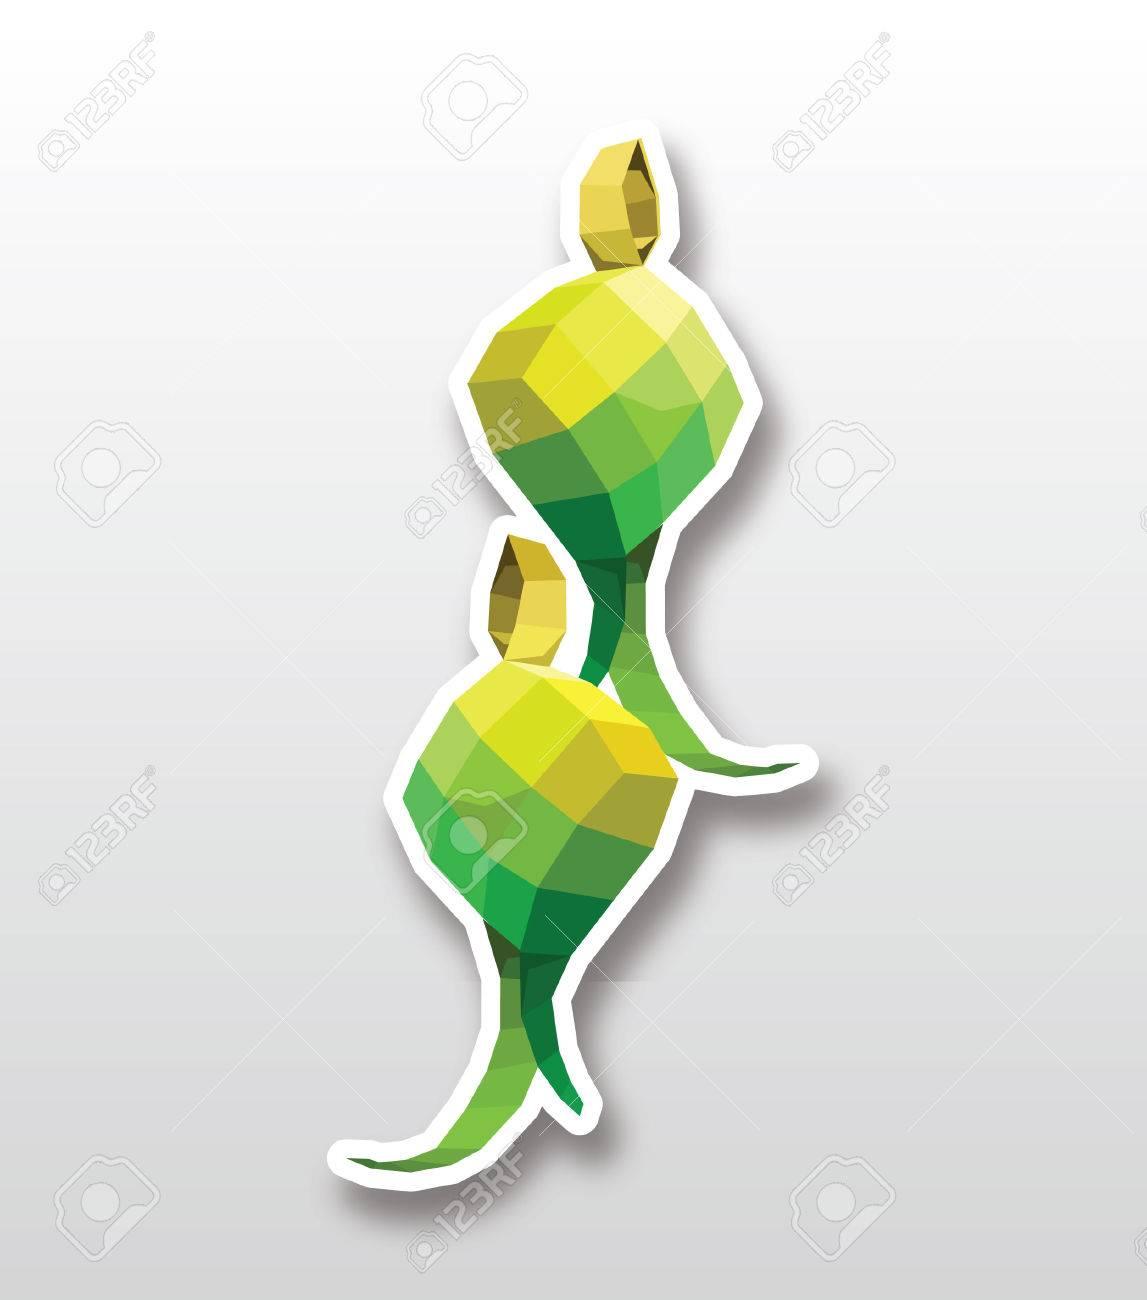 icons of ketupat royalty free cliparts vectors and stock illustration image 39156263 icons of ketupat